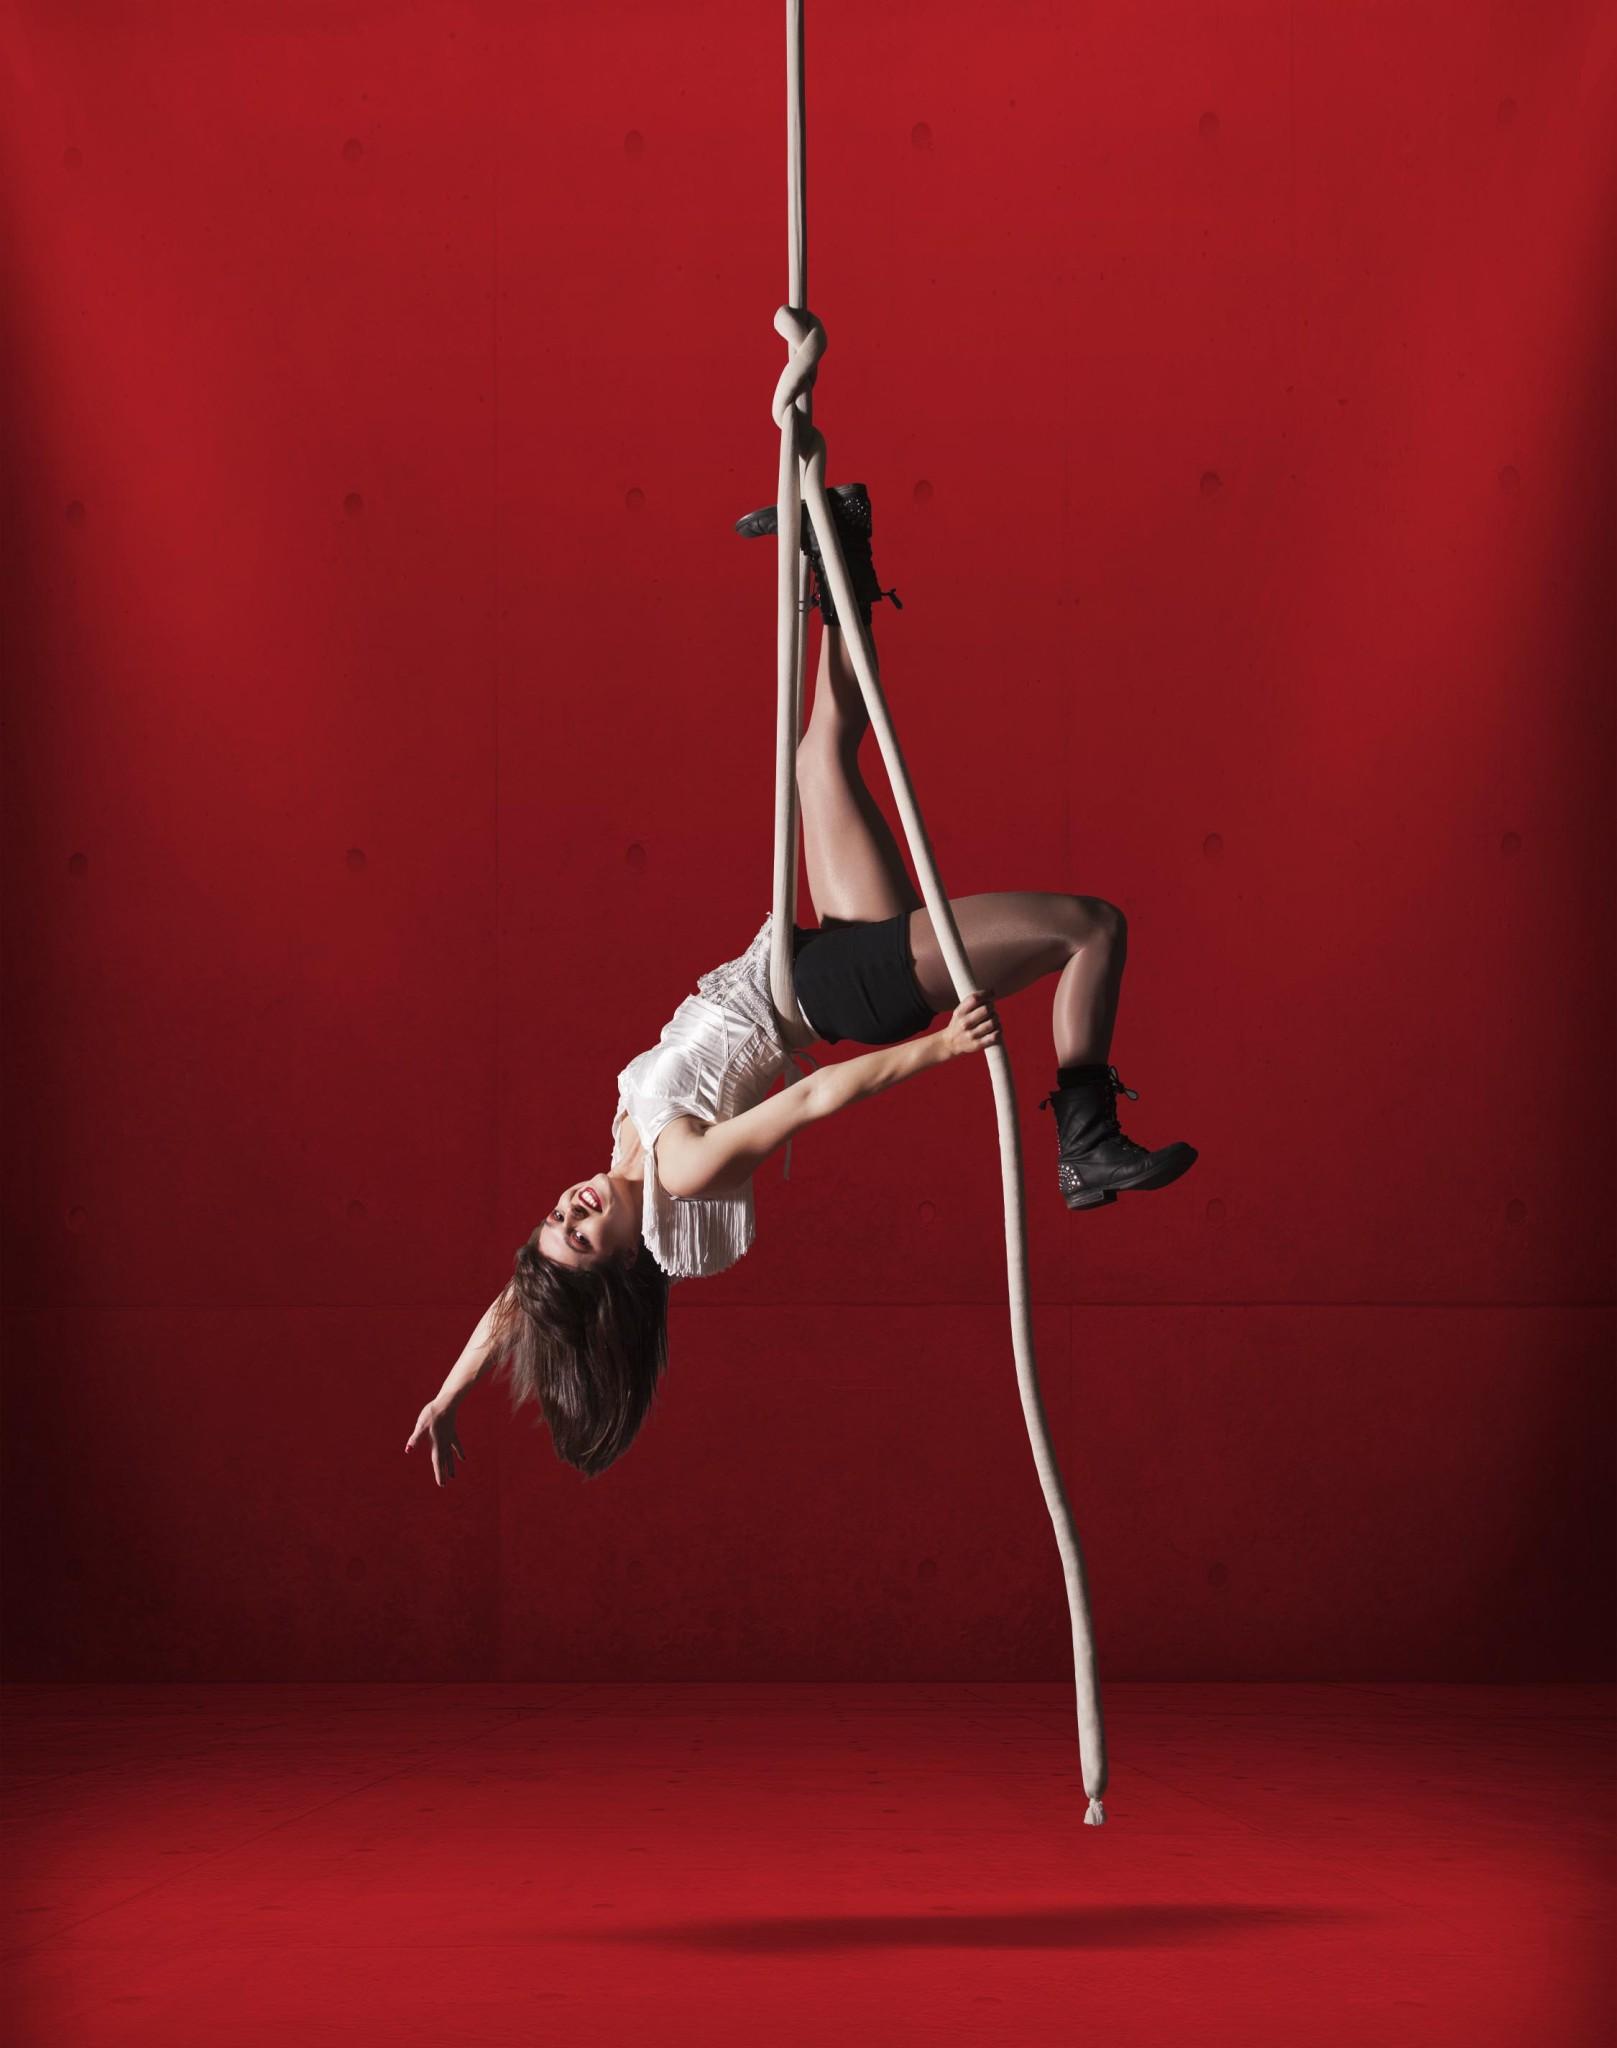 NICA annual Circus Showcase ROUGE et BLANC